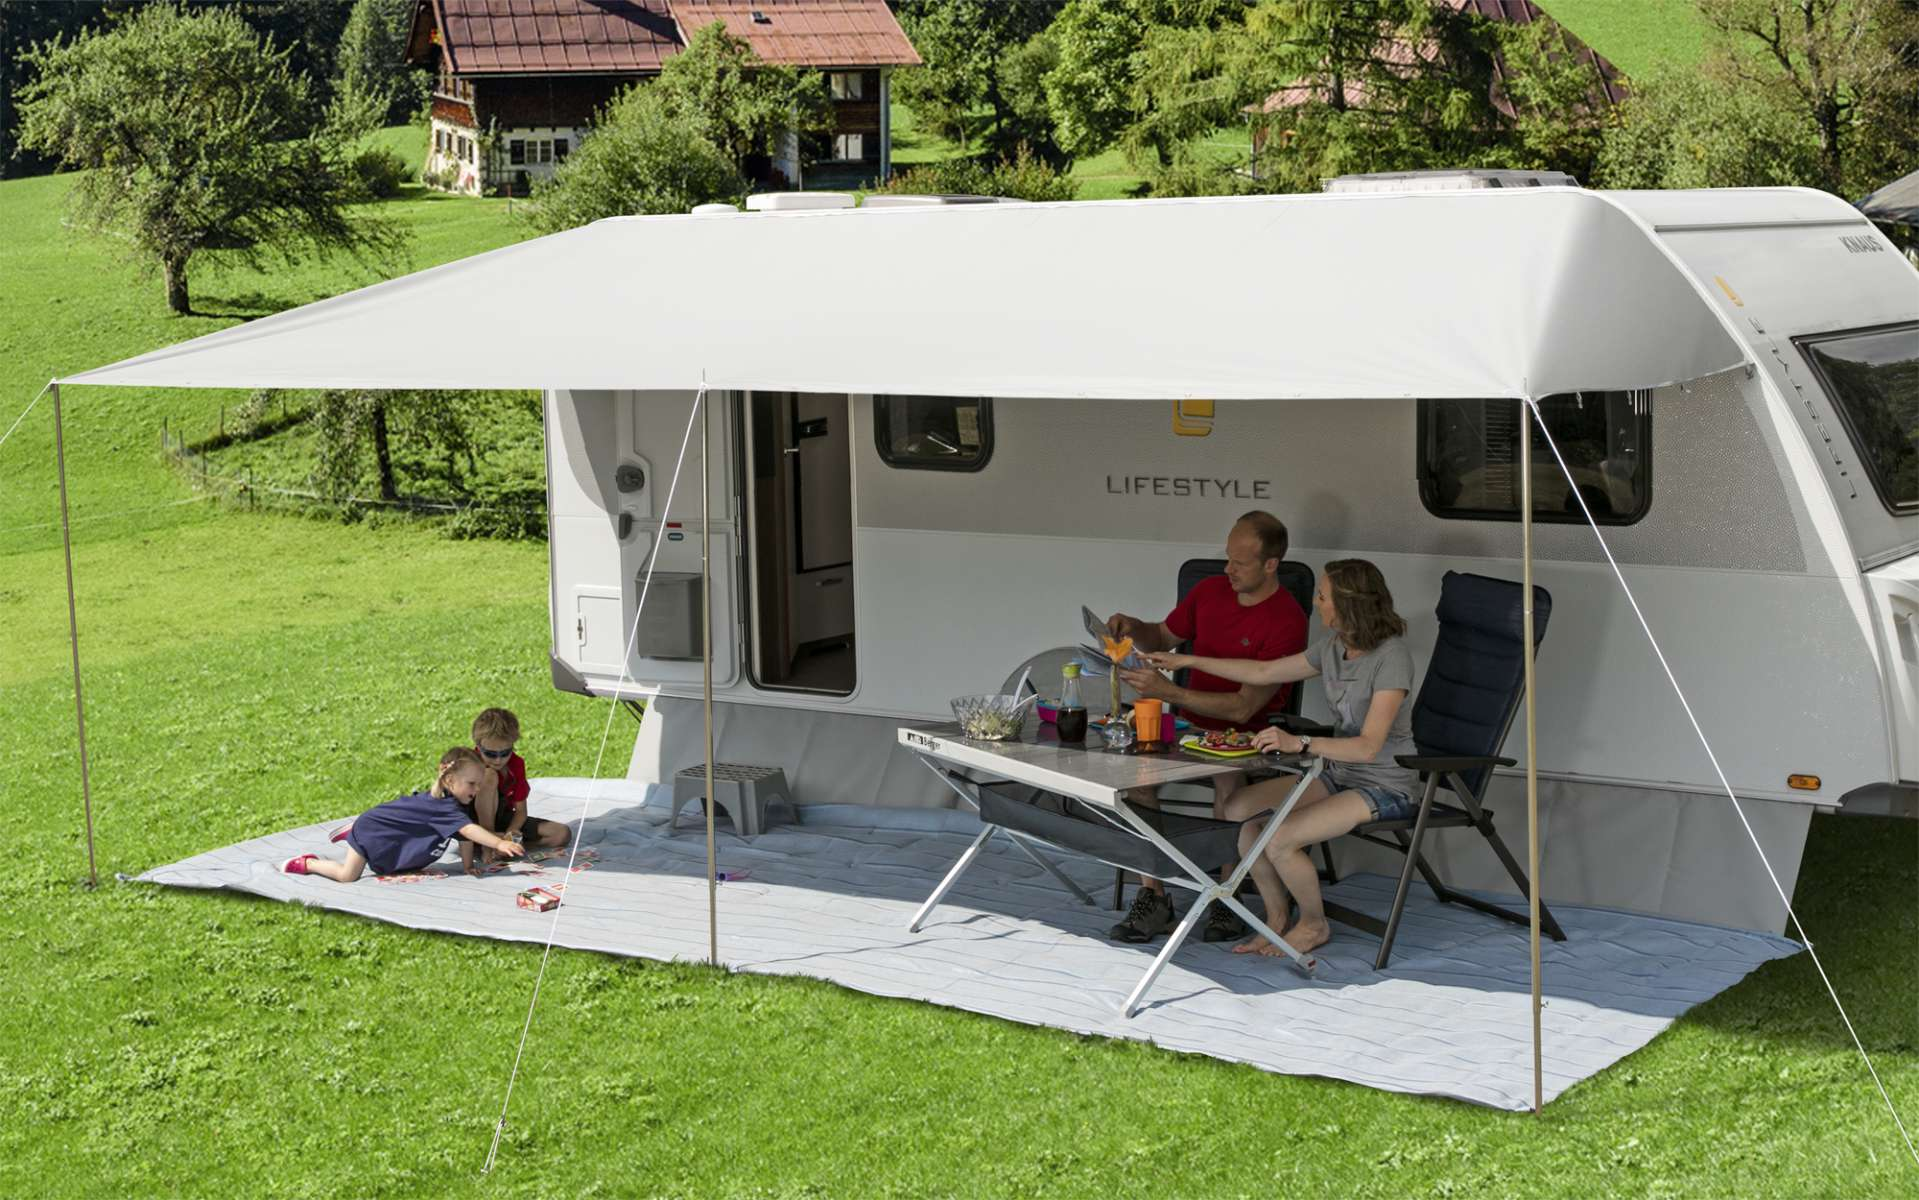 sonnenvordach camping sonnenschutz f r wohnwagen caravan. Black Bedroom Furniture Sets. Home Design Ideas